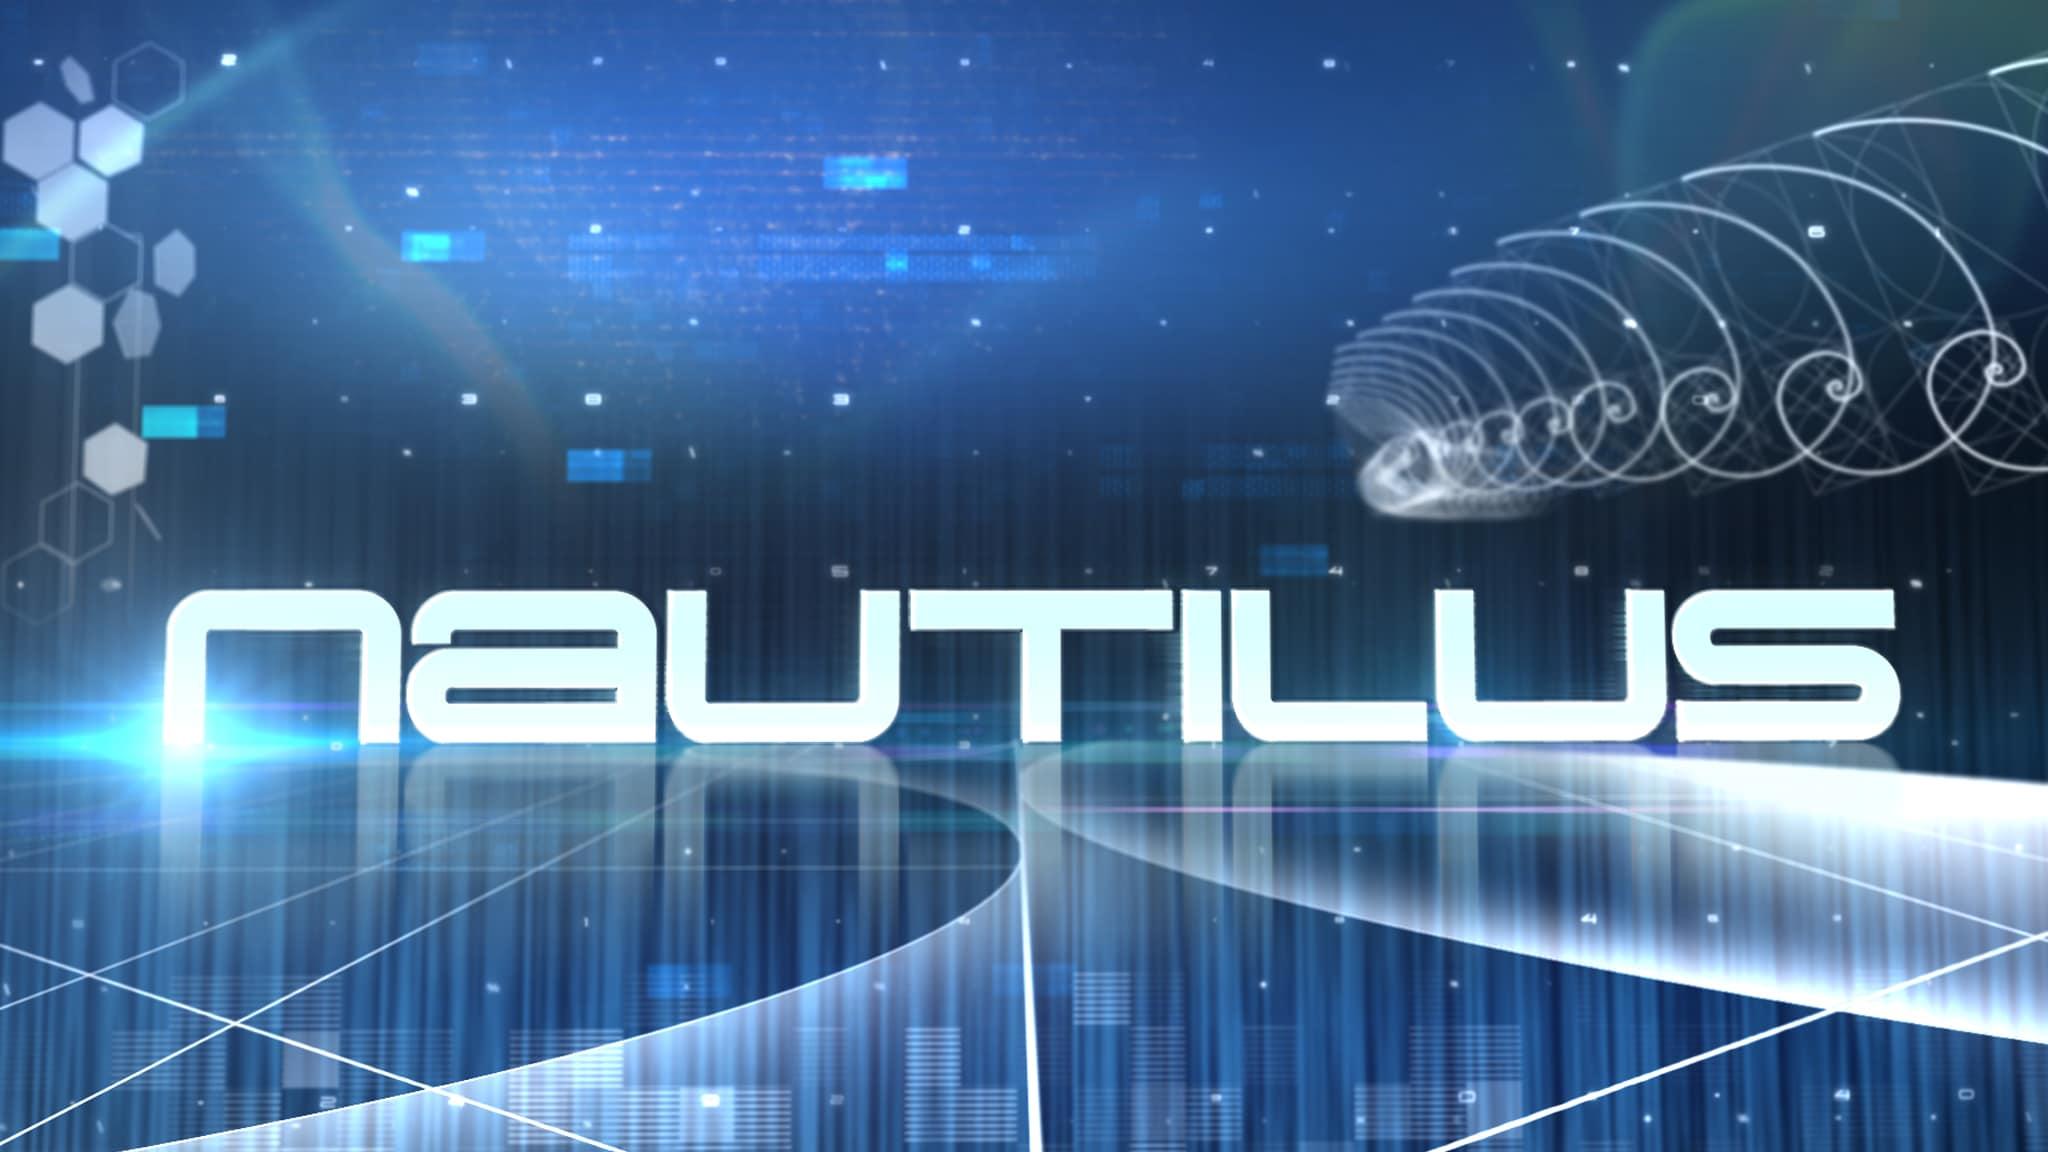 Rai Scuola Memex Nautilus - Batterie cariche di ricerca Replica